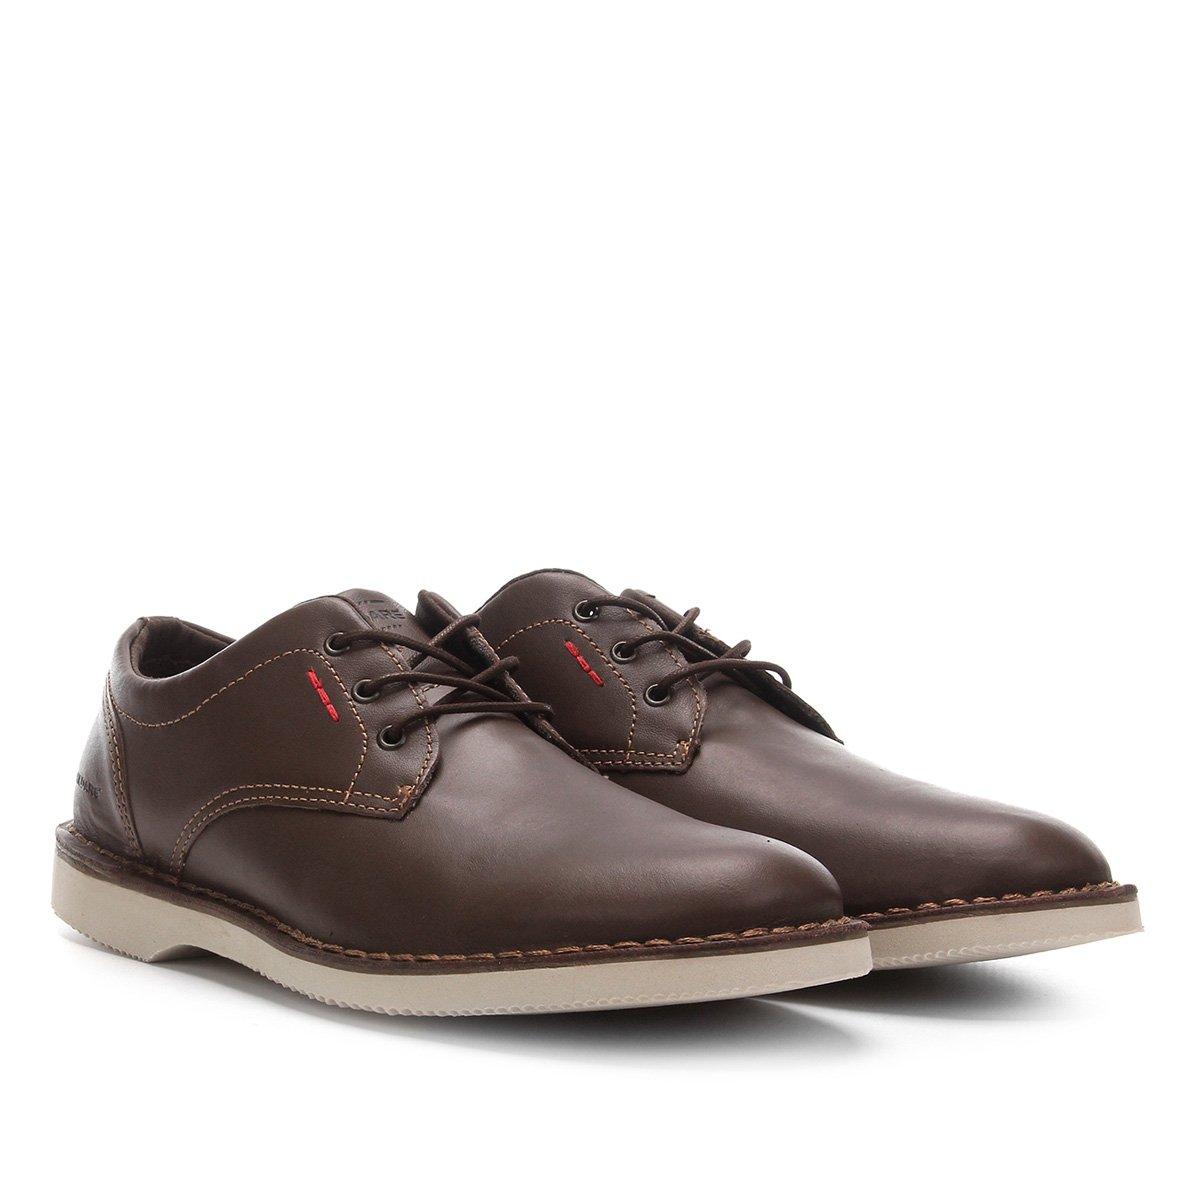 2e41d55e785a6 Sapato Casual Couro Kildare Fylei Masculino | Livelo -Sua Vida com ...